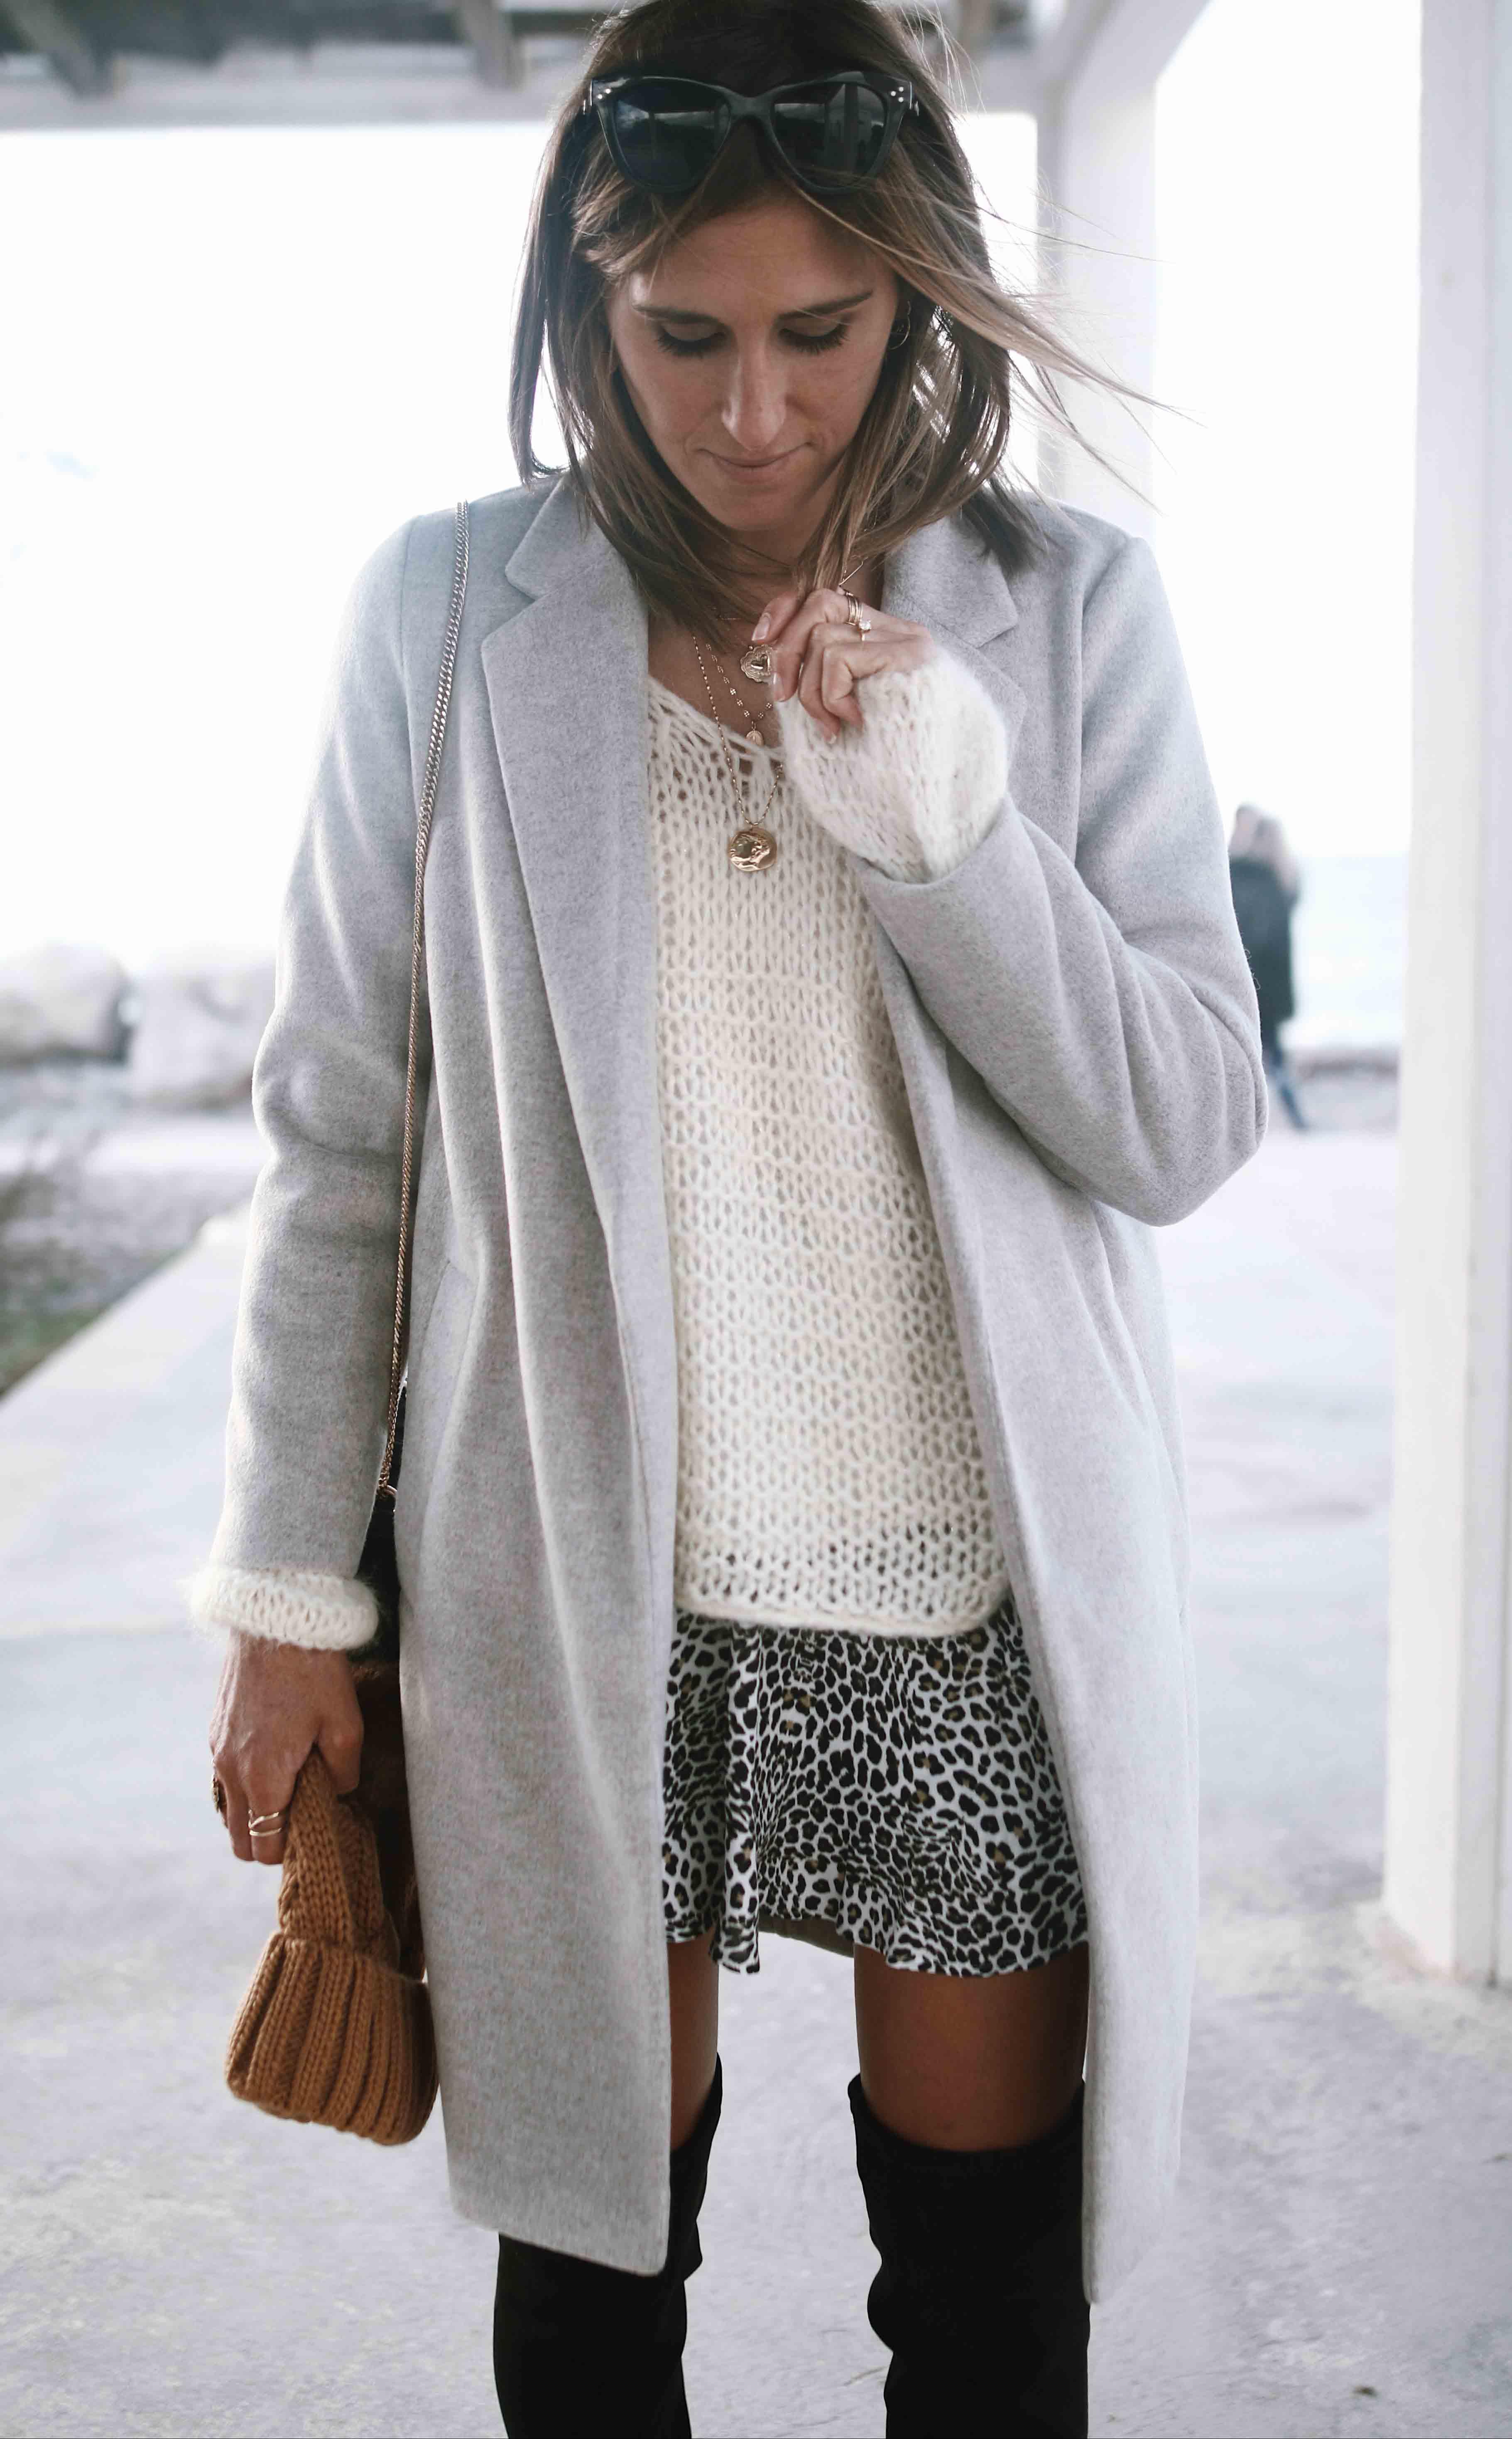 CHON & Chon - @chon.and.chon mini jupe lepoard, cuissardes, manteau laine pull laine